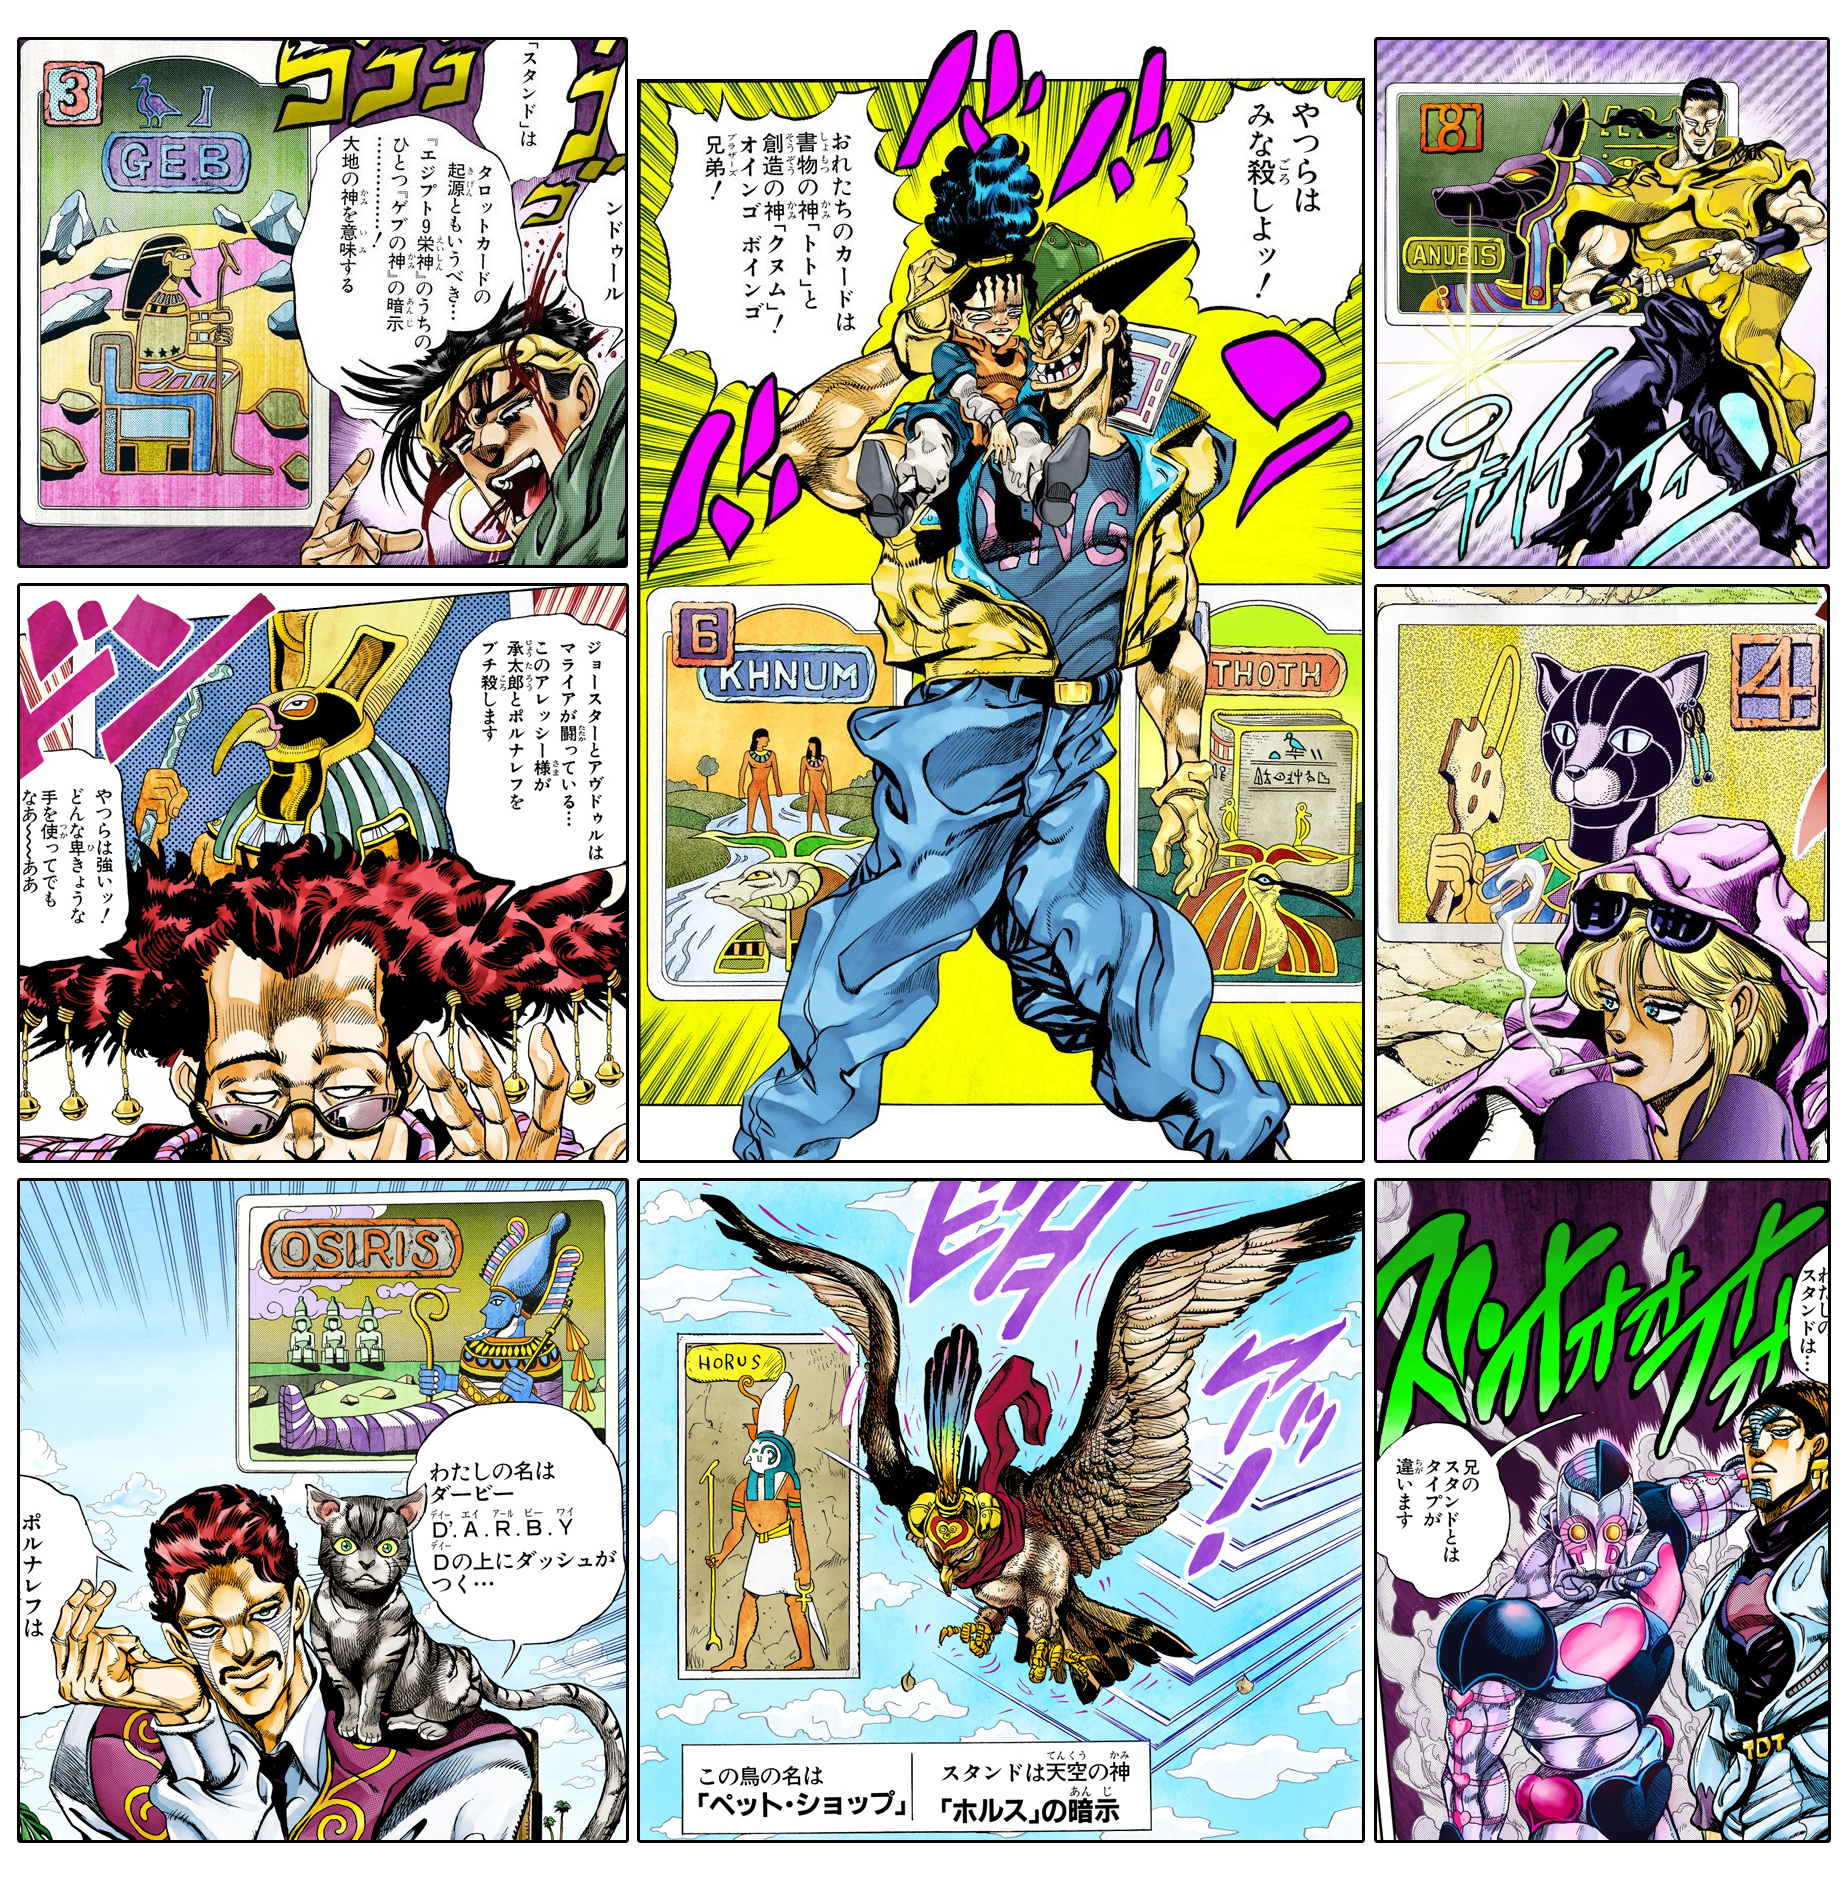 Egypt 9 Glory Gods Infobox Manga.png